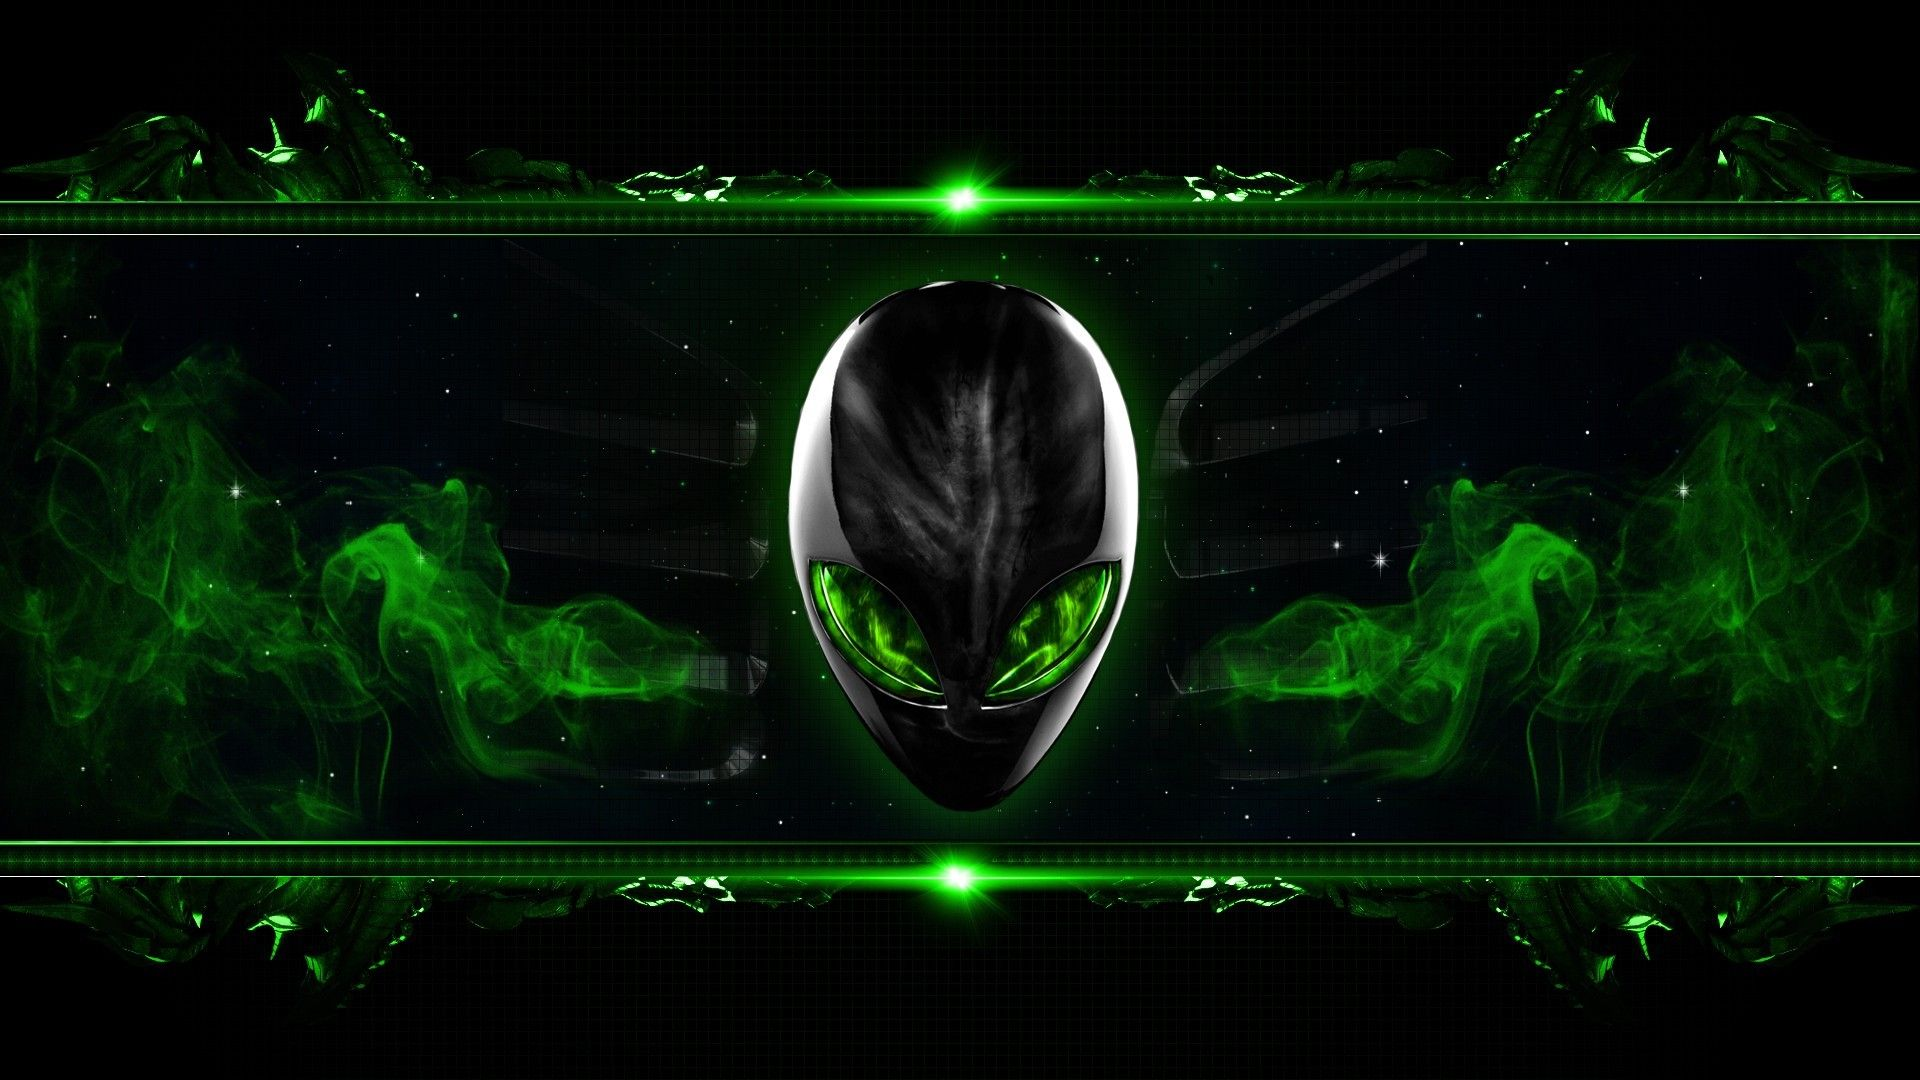 Computer Pc Gaming Green Alienware Wallpaper In 2020 Background Images Wallpapers Full Hd Wallpaper Alienware